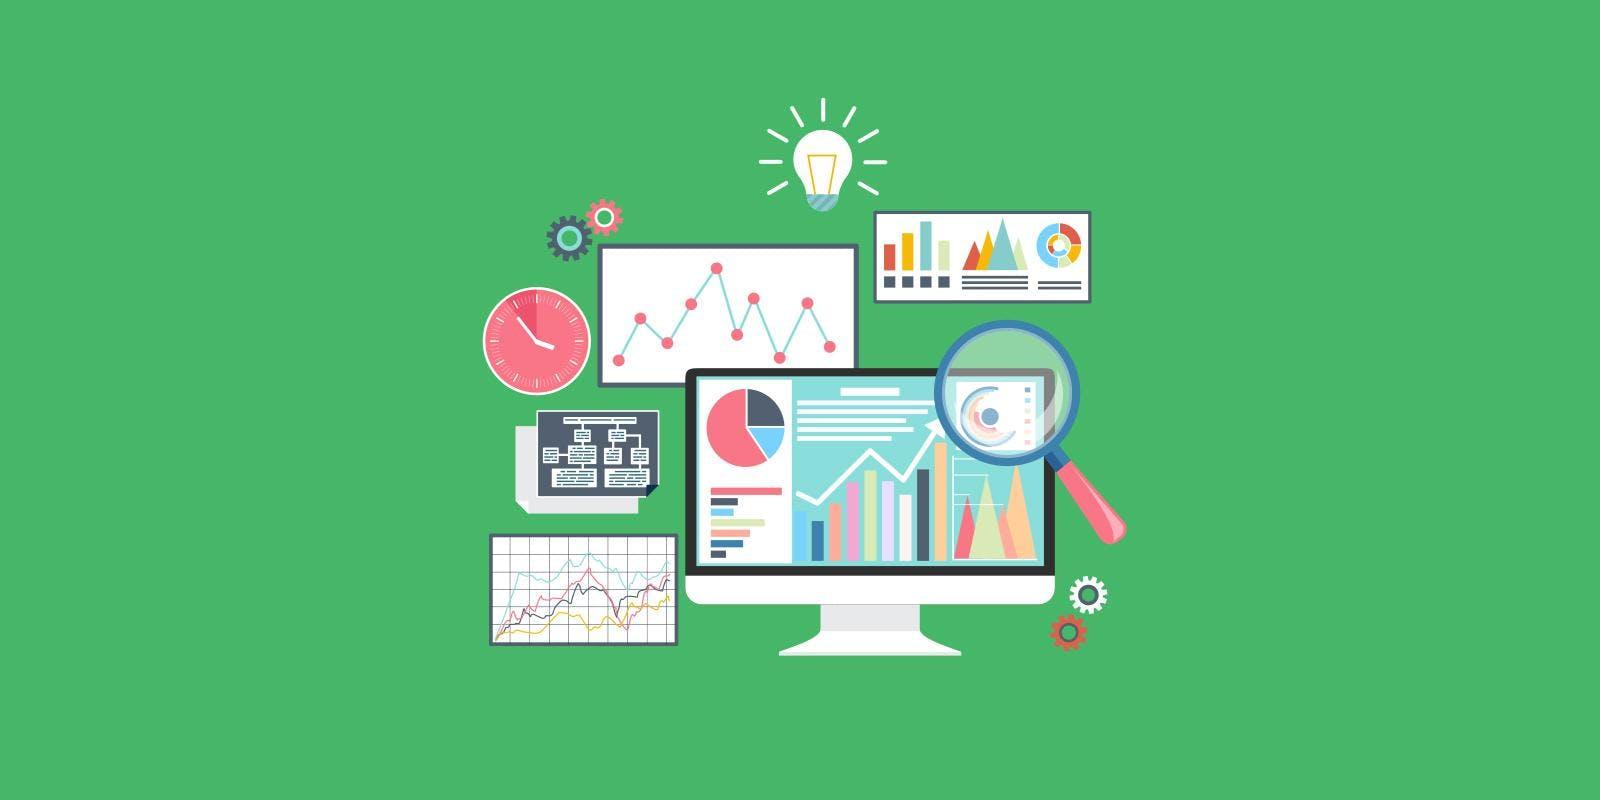 Praktijkcursus Datavisualisatie en Dashboard Design | 31 januari, 7, 14 februari & 13 maart 2020 | IIR Amsterdam